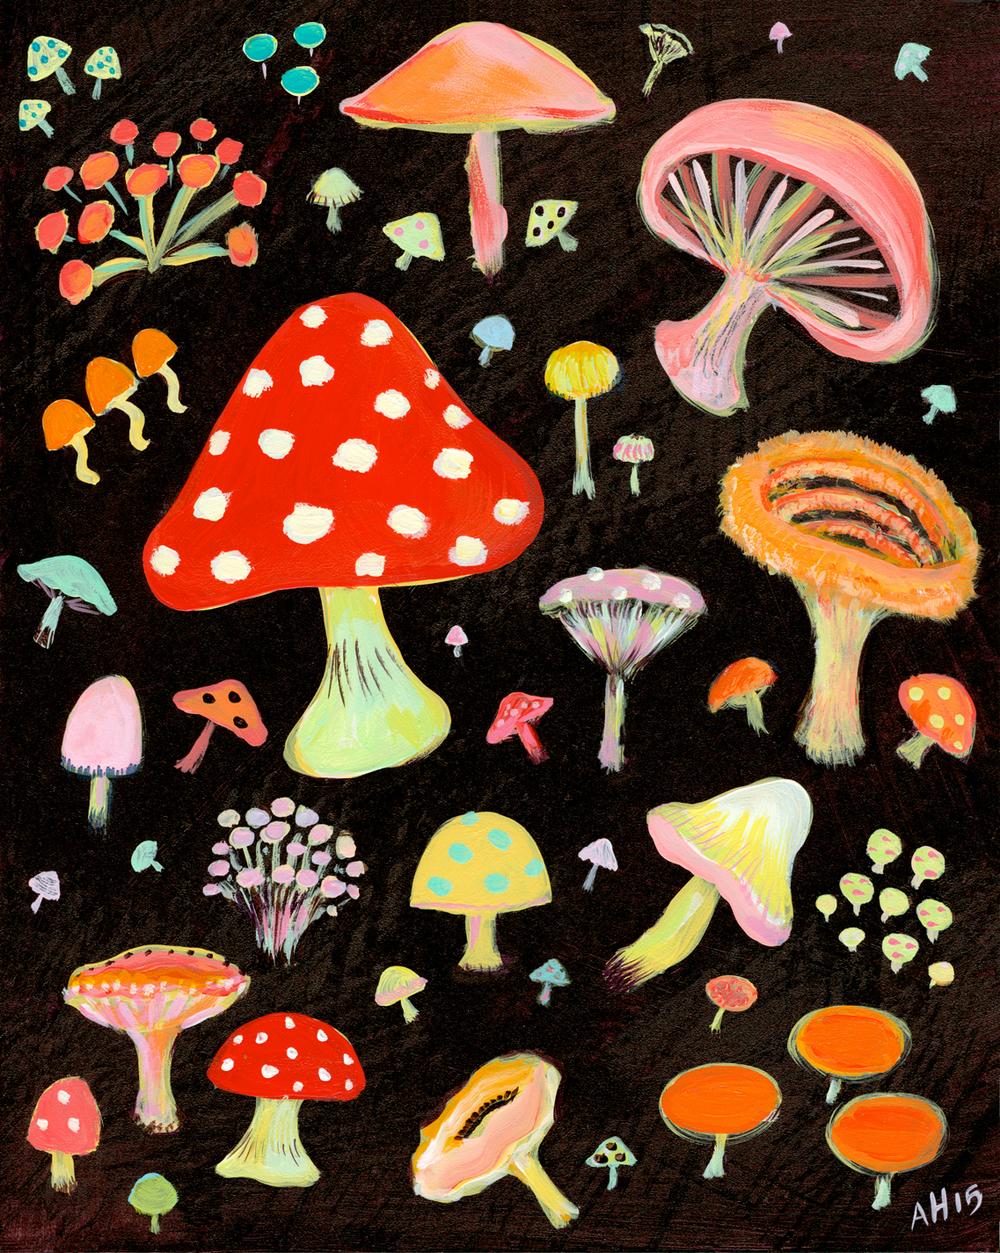 Allyn_Howard_Mushrooms.jpg